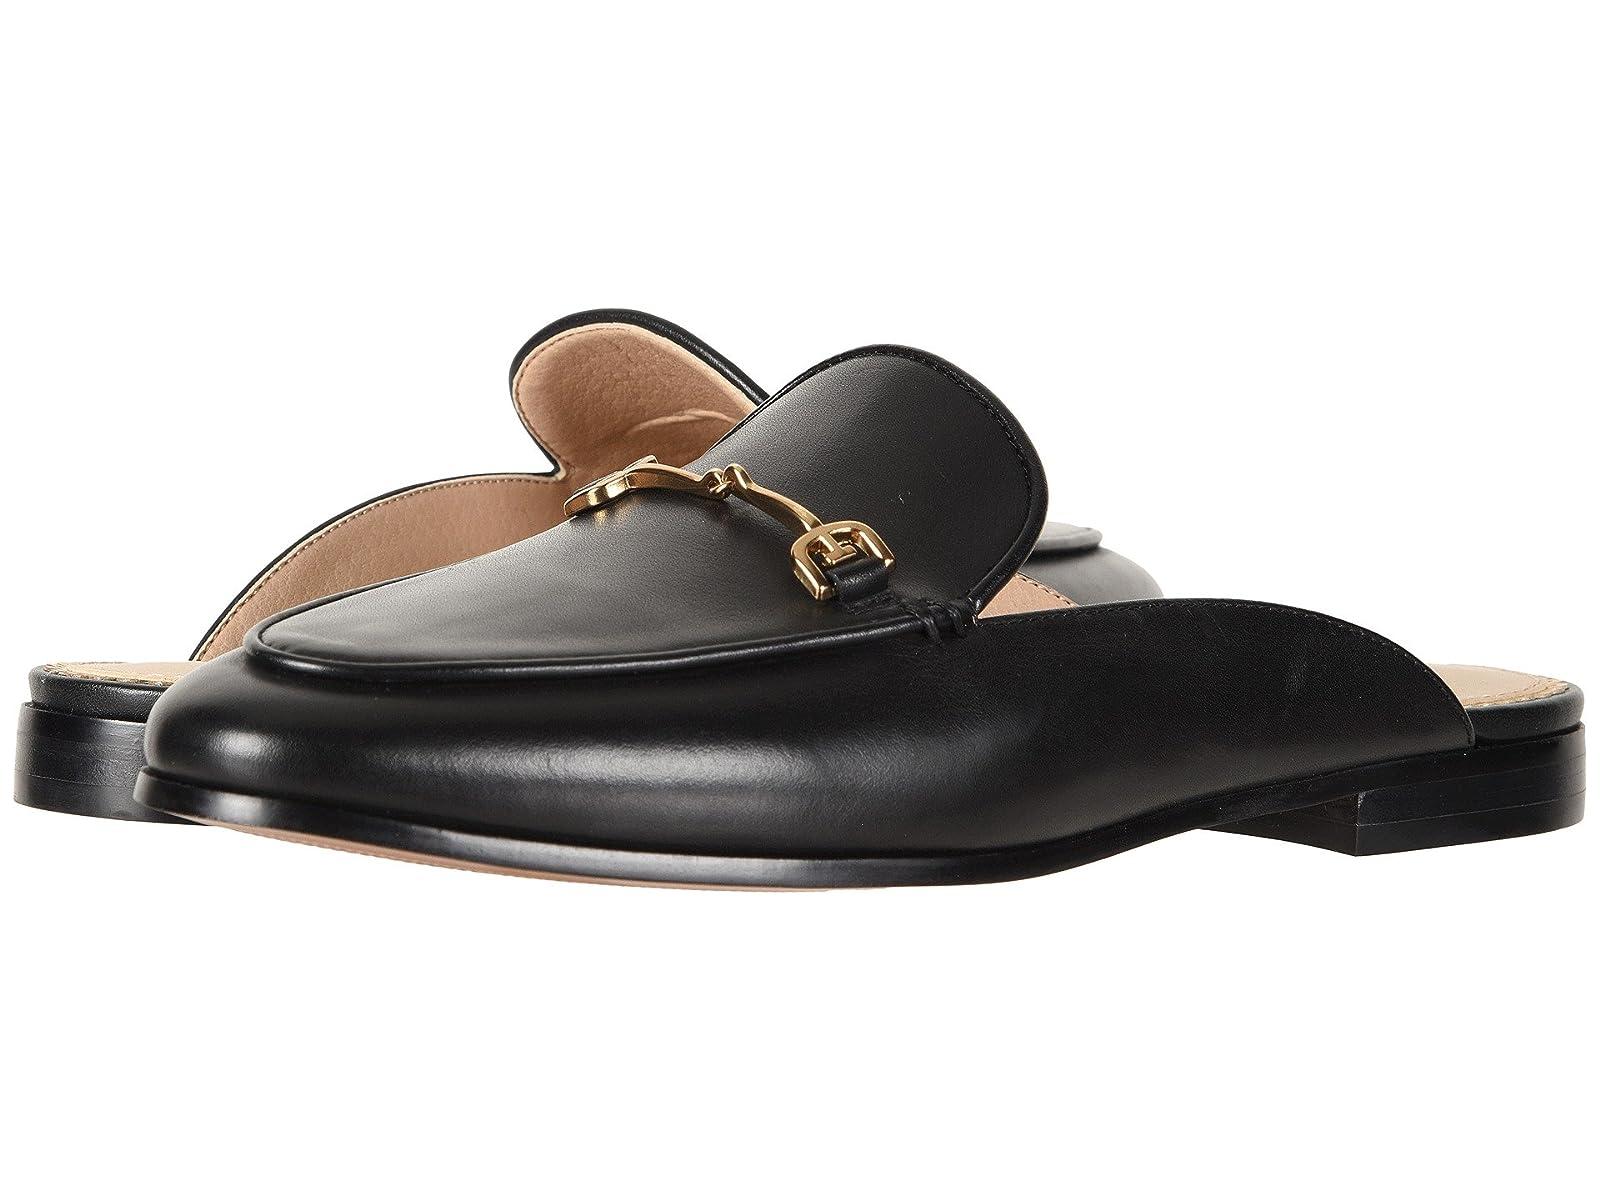 Sam Edelman LinnieAtmospheric grades have affordable shoes